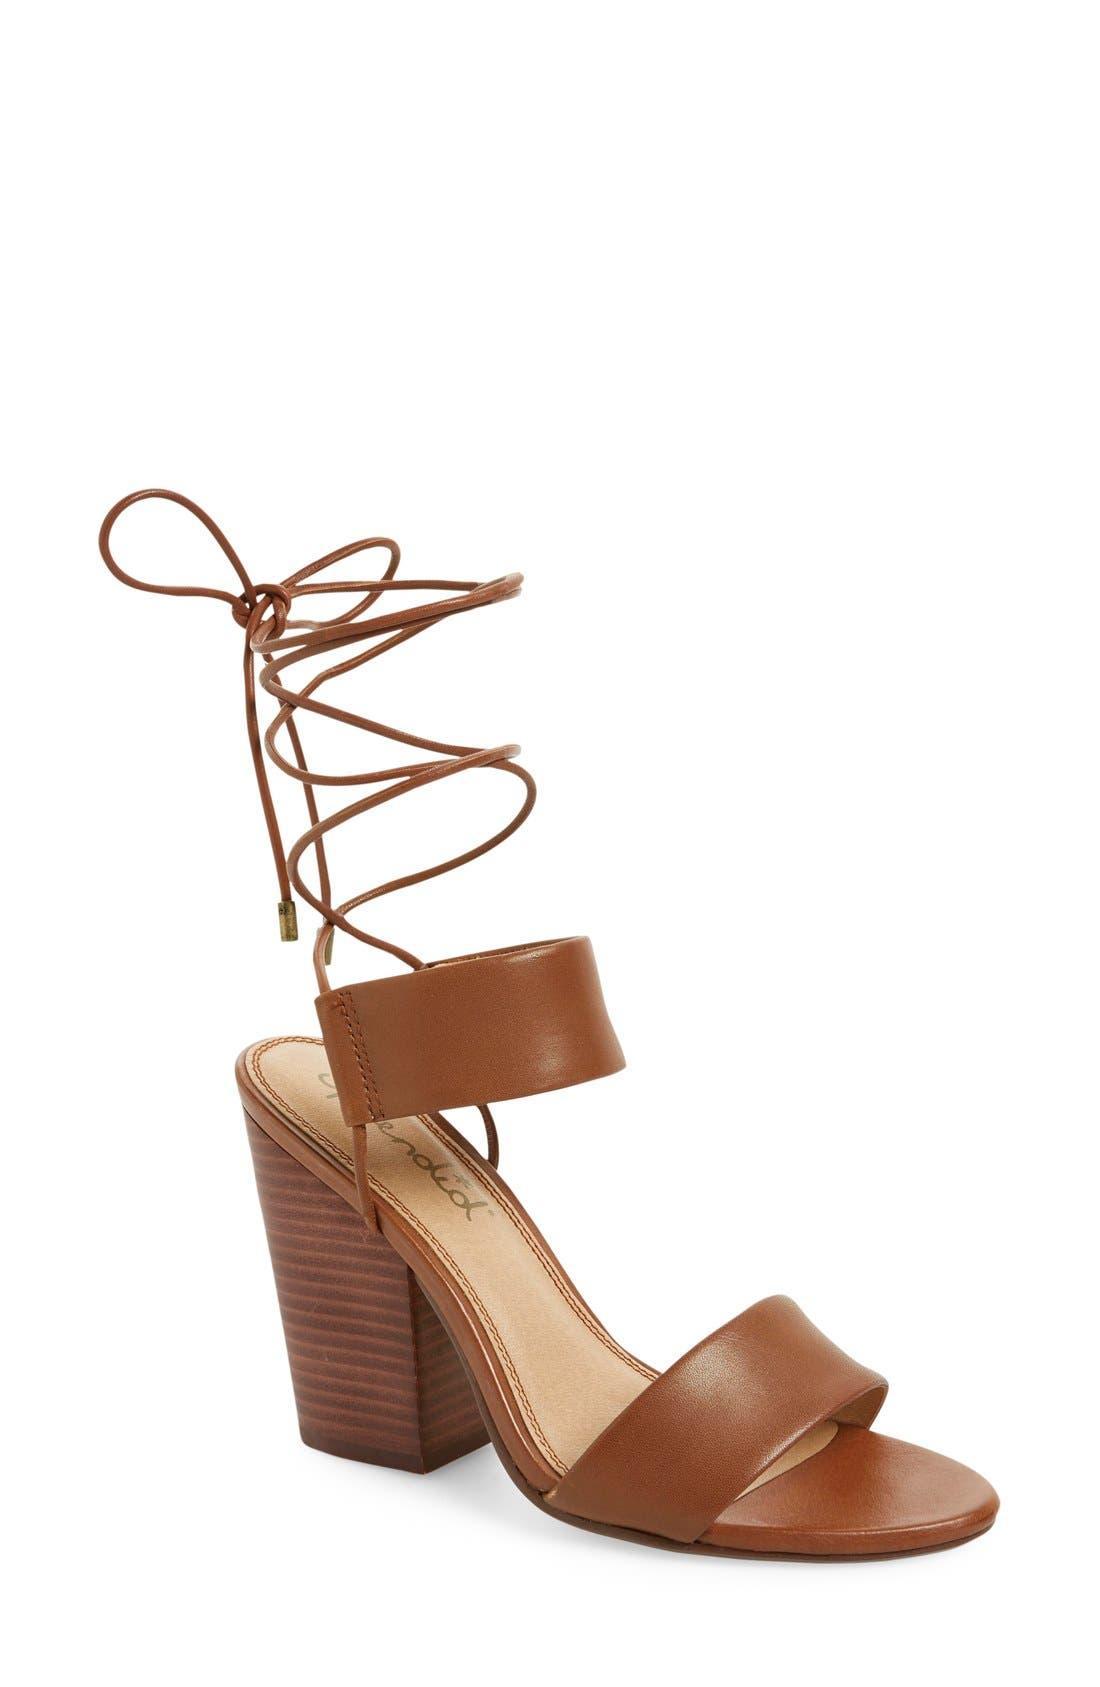 Alternate Image 1 Selected - Splendid 'Kenya' Wraparound Lace Sandal (Women)